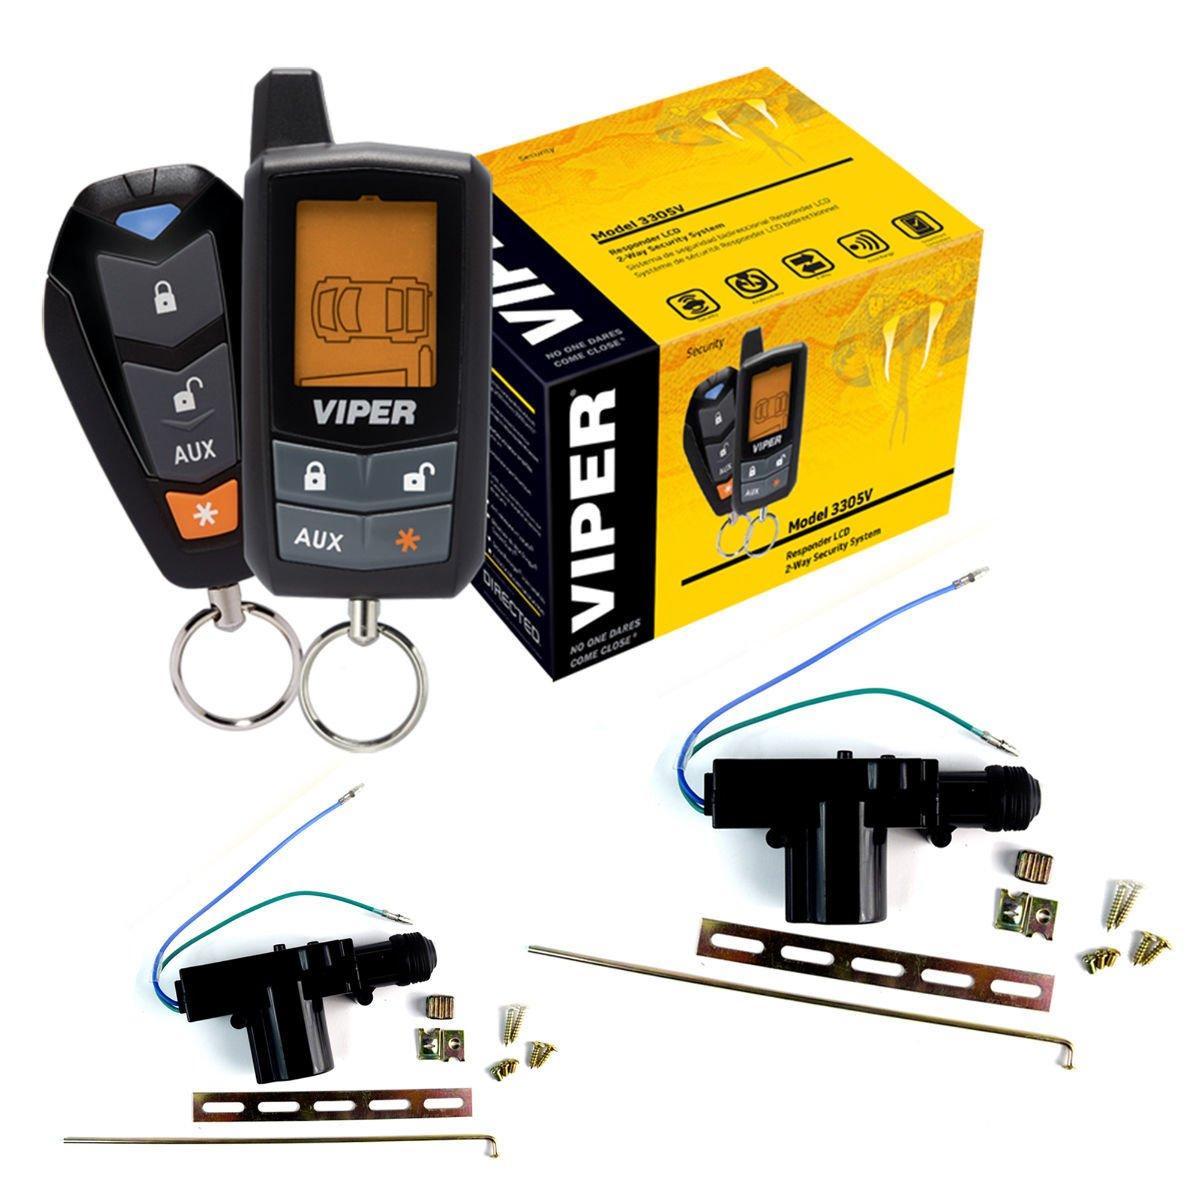 3305V DEI Viper 2 way Keyless Entry Security Alarm System With 2 Door Locks